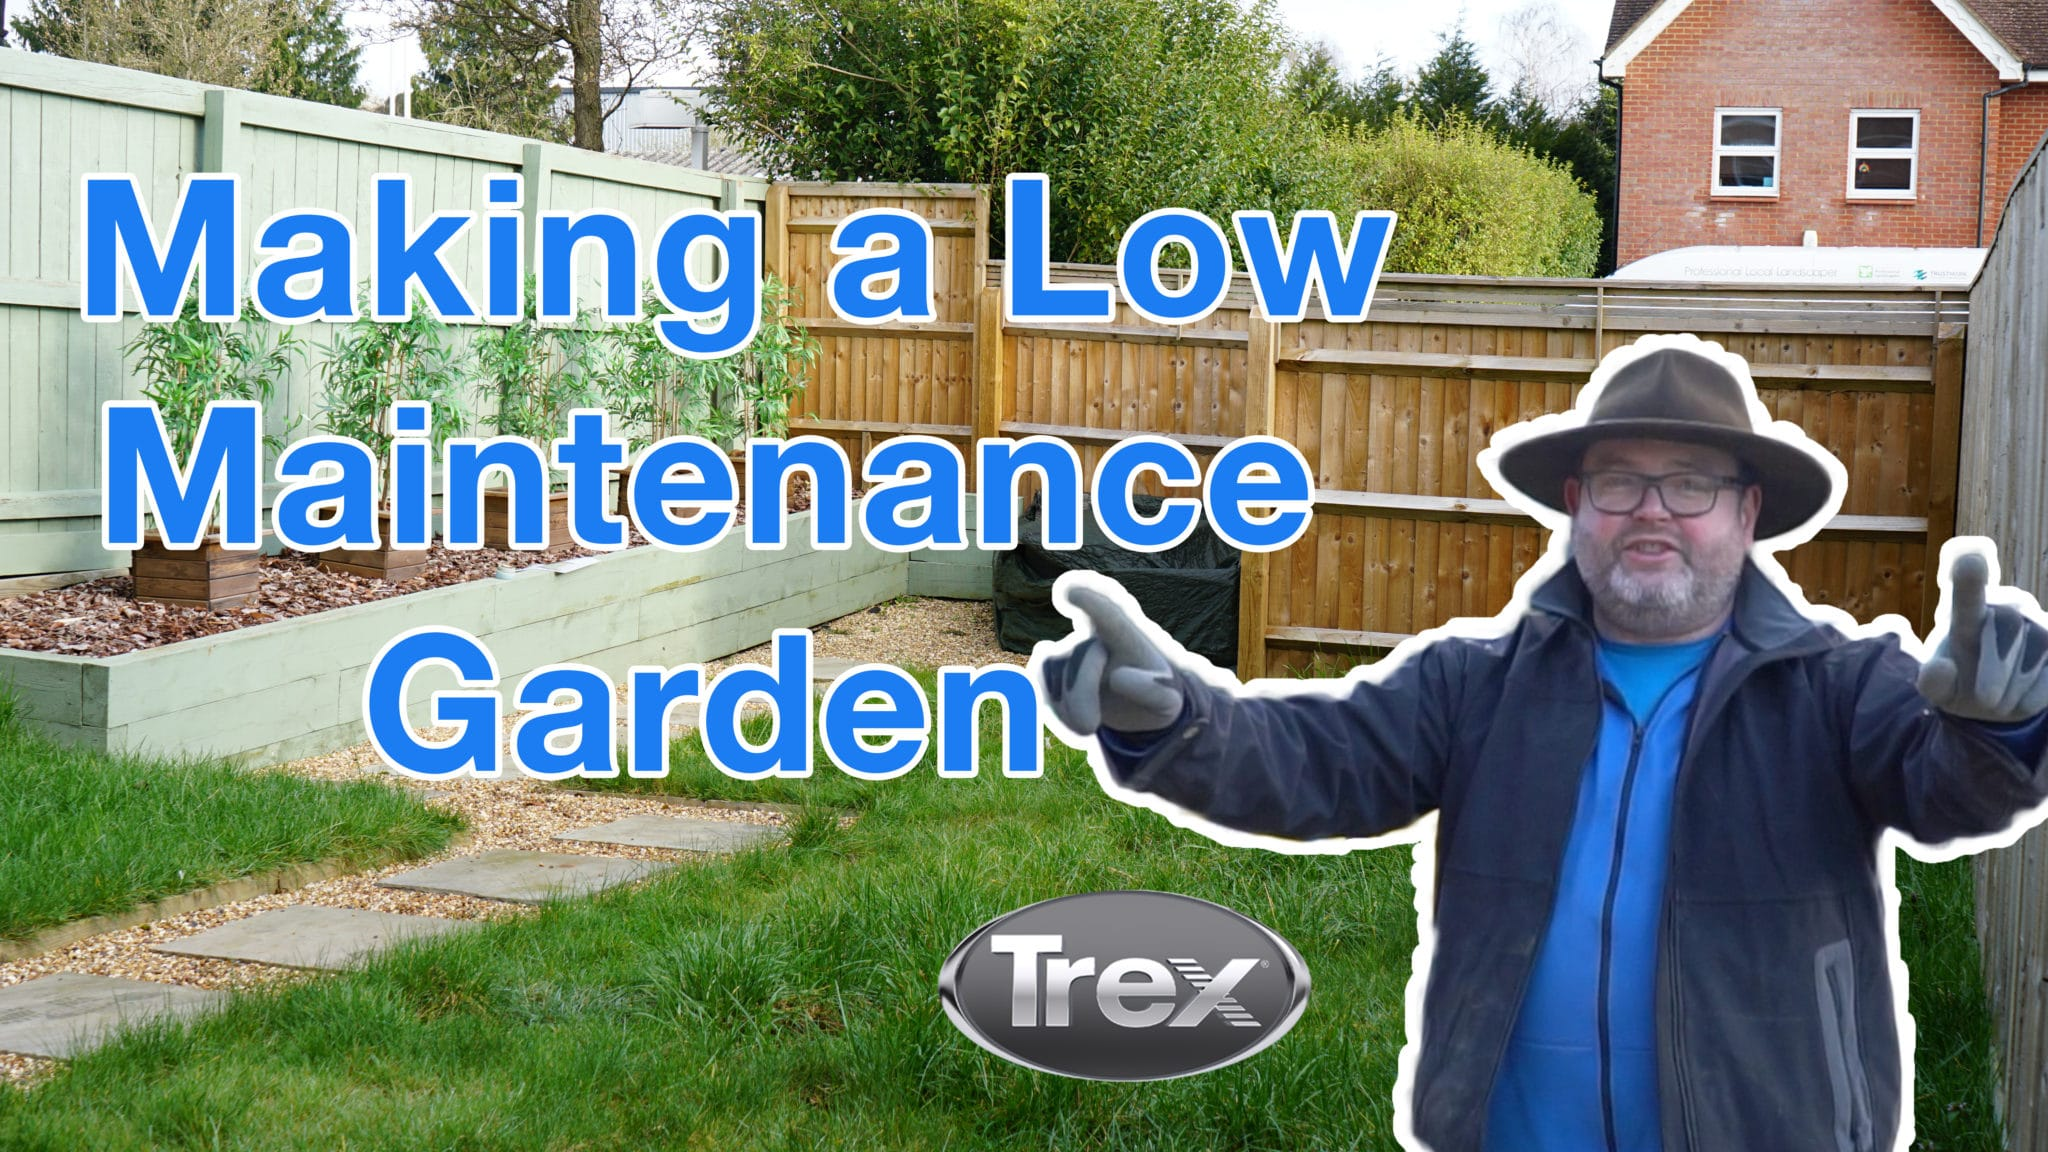 Making a low maintenance garden